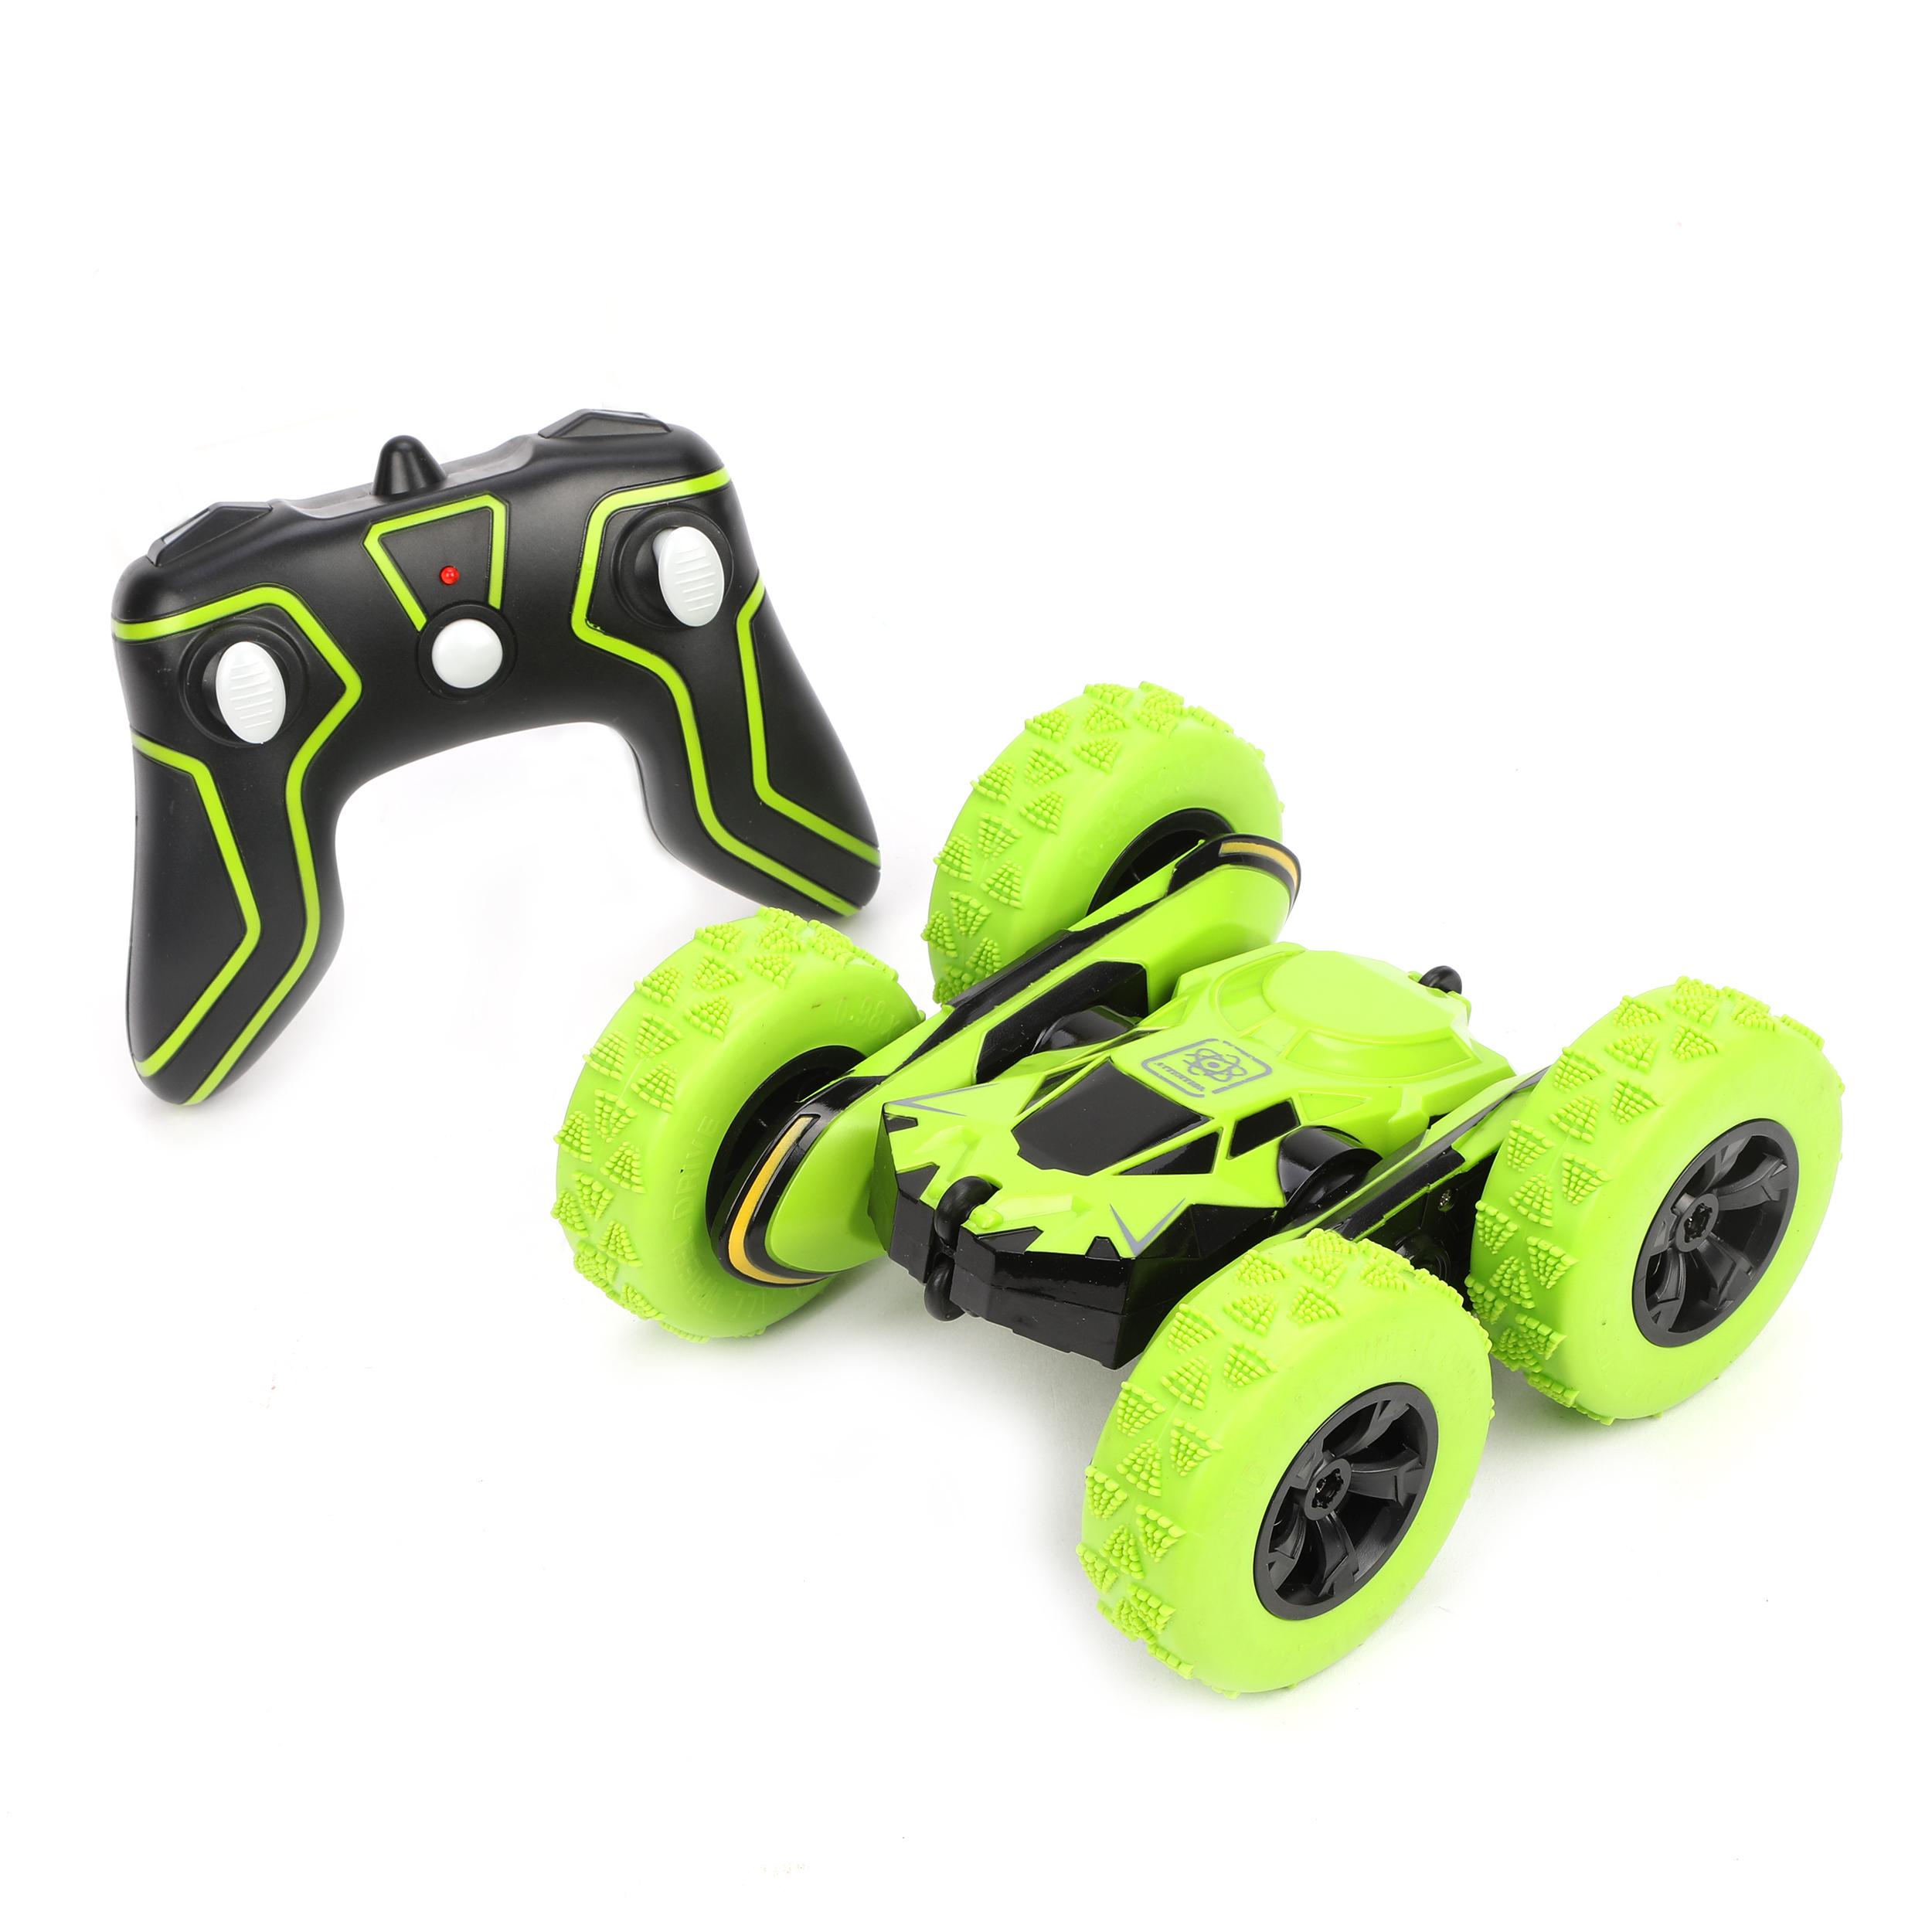 цена на Машина на радиоуправлении Наша игрушка зеленый 4 канала 1:28